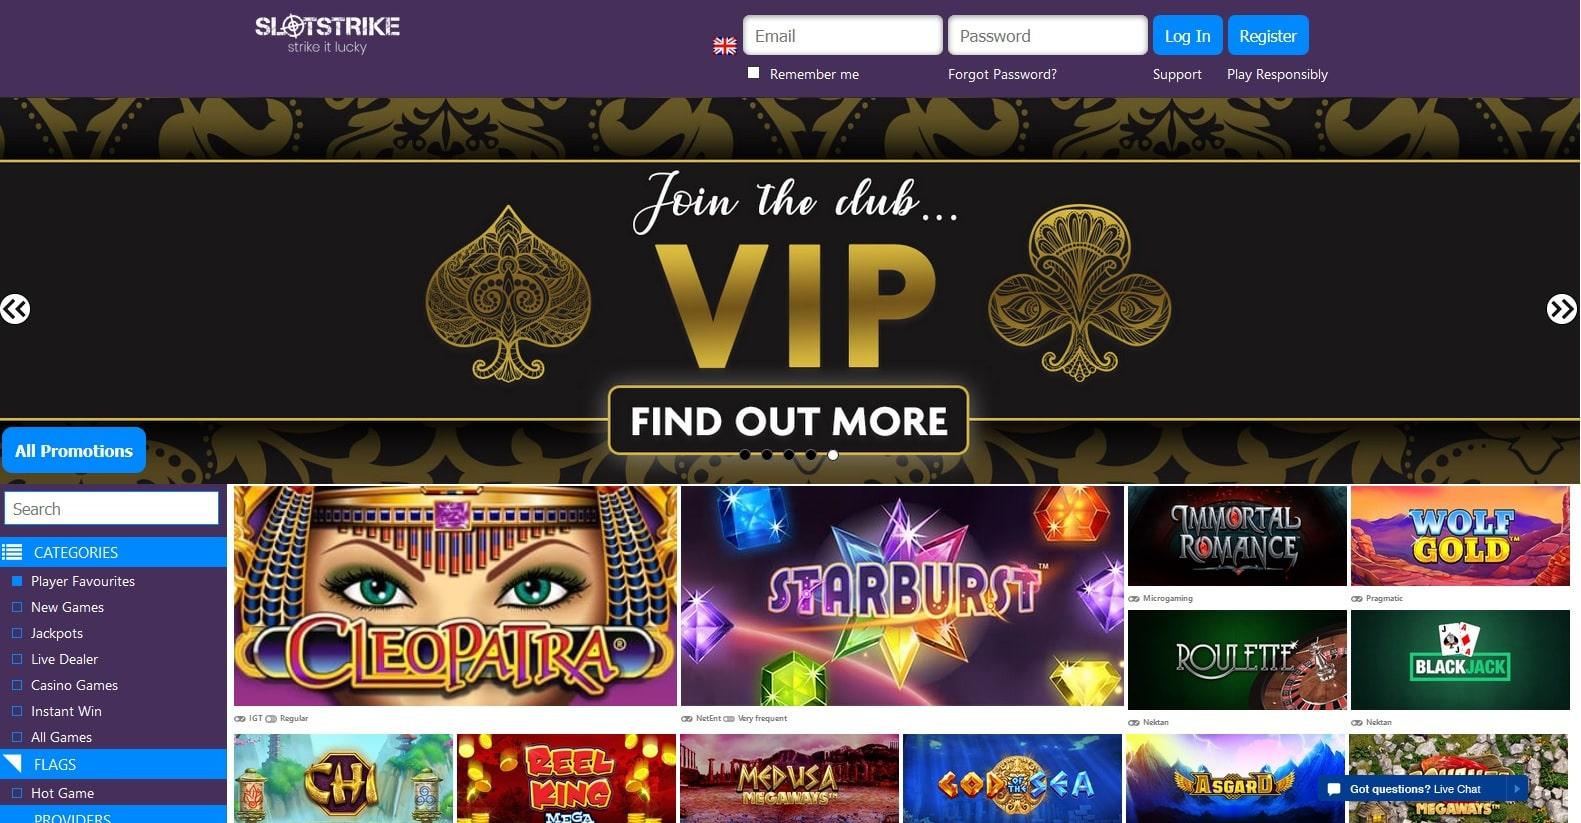 slotstrike mobile casino lobby